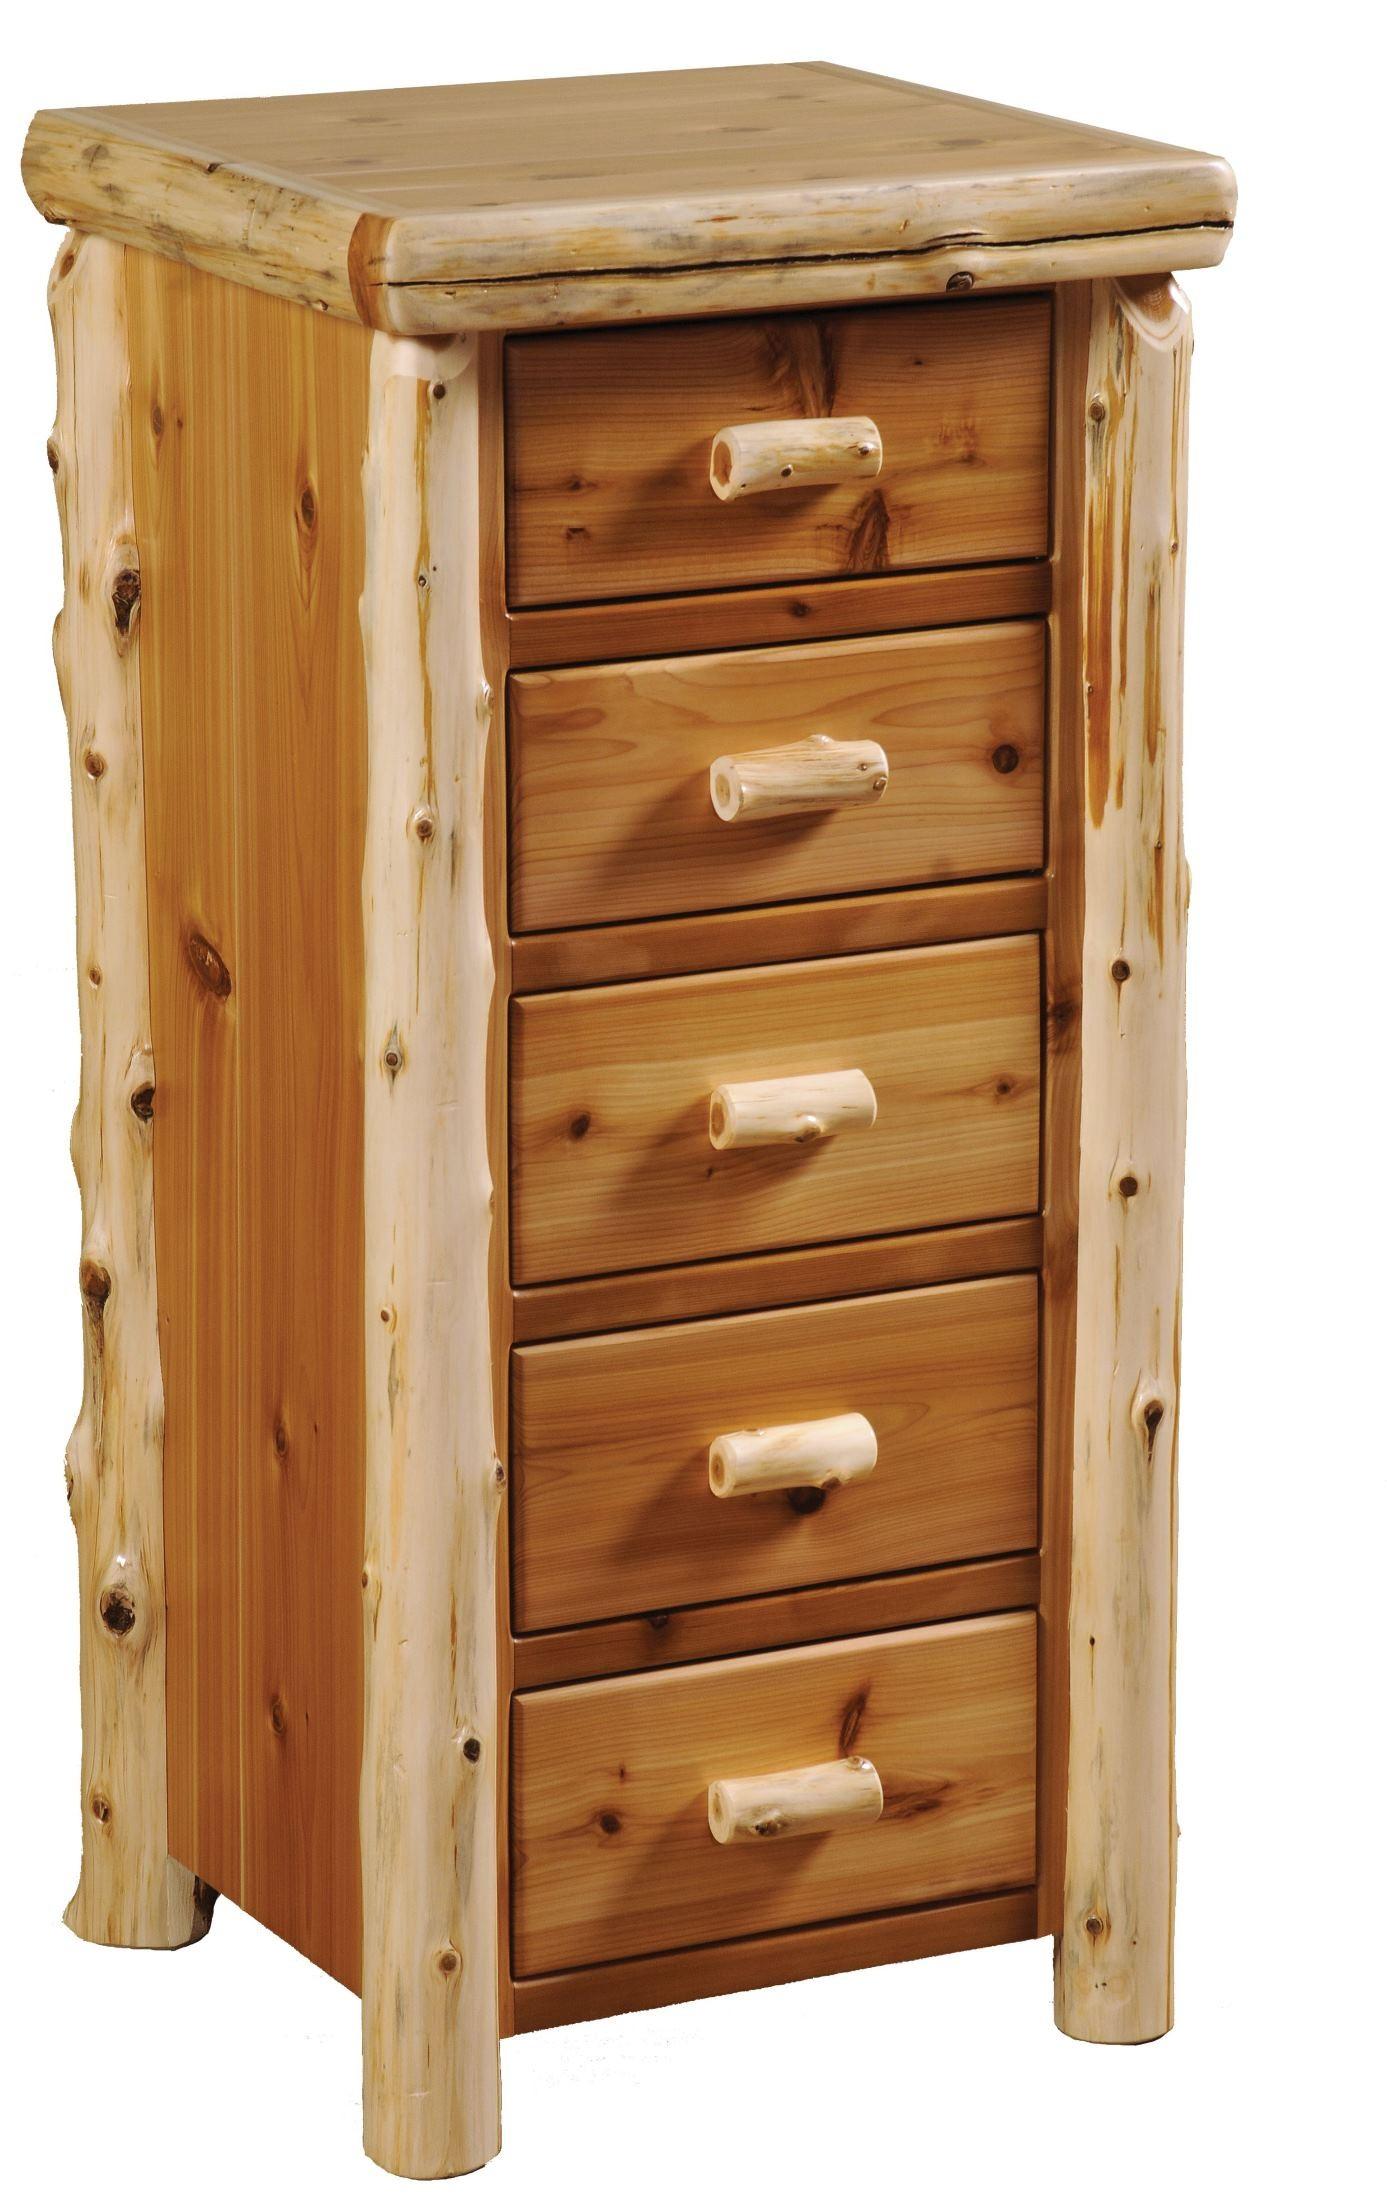 Traditional cedar youth log bedroom set from fireside lodge 10100 coleman furniture - Cedar bedroom furniture ...